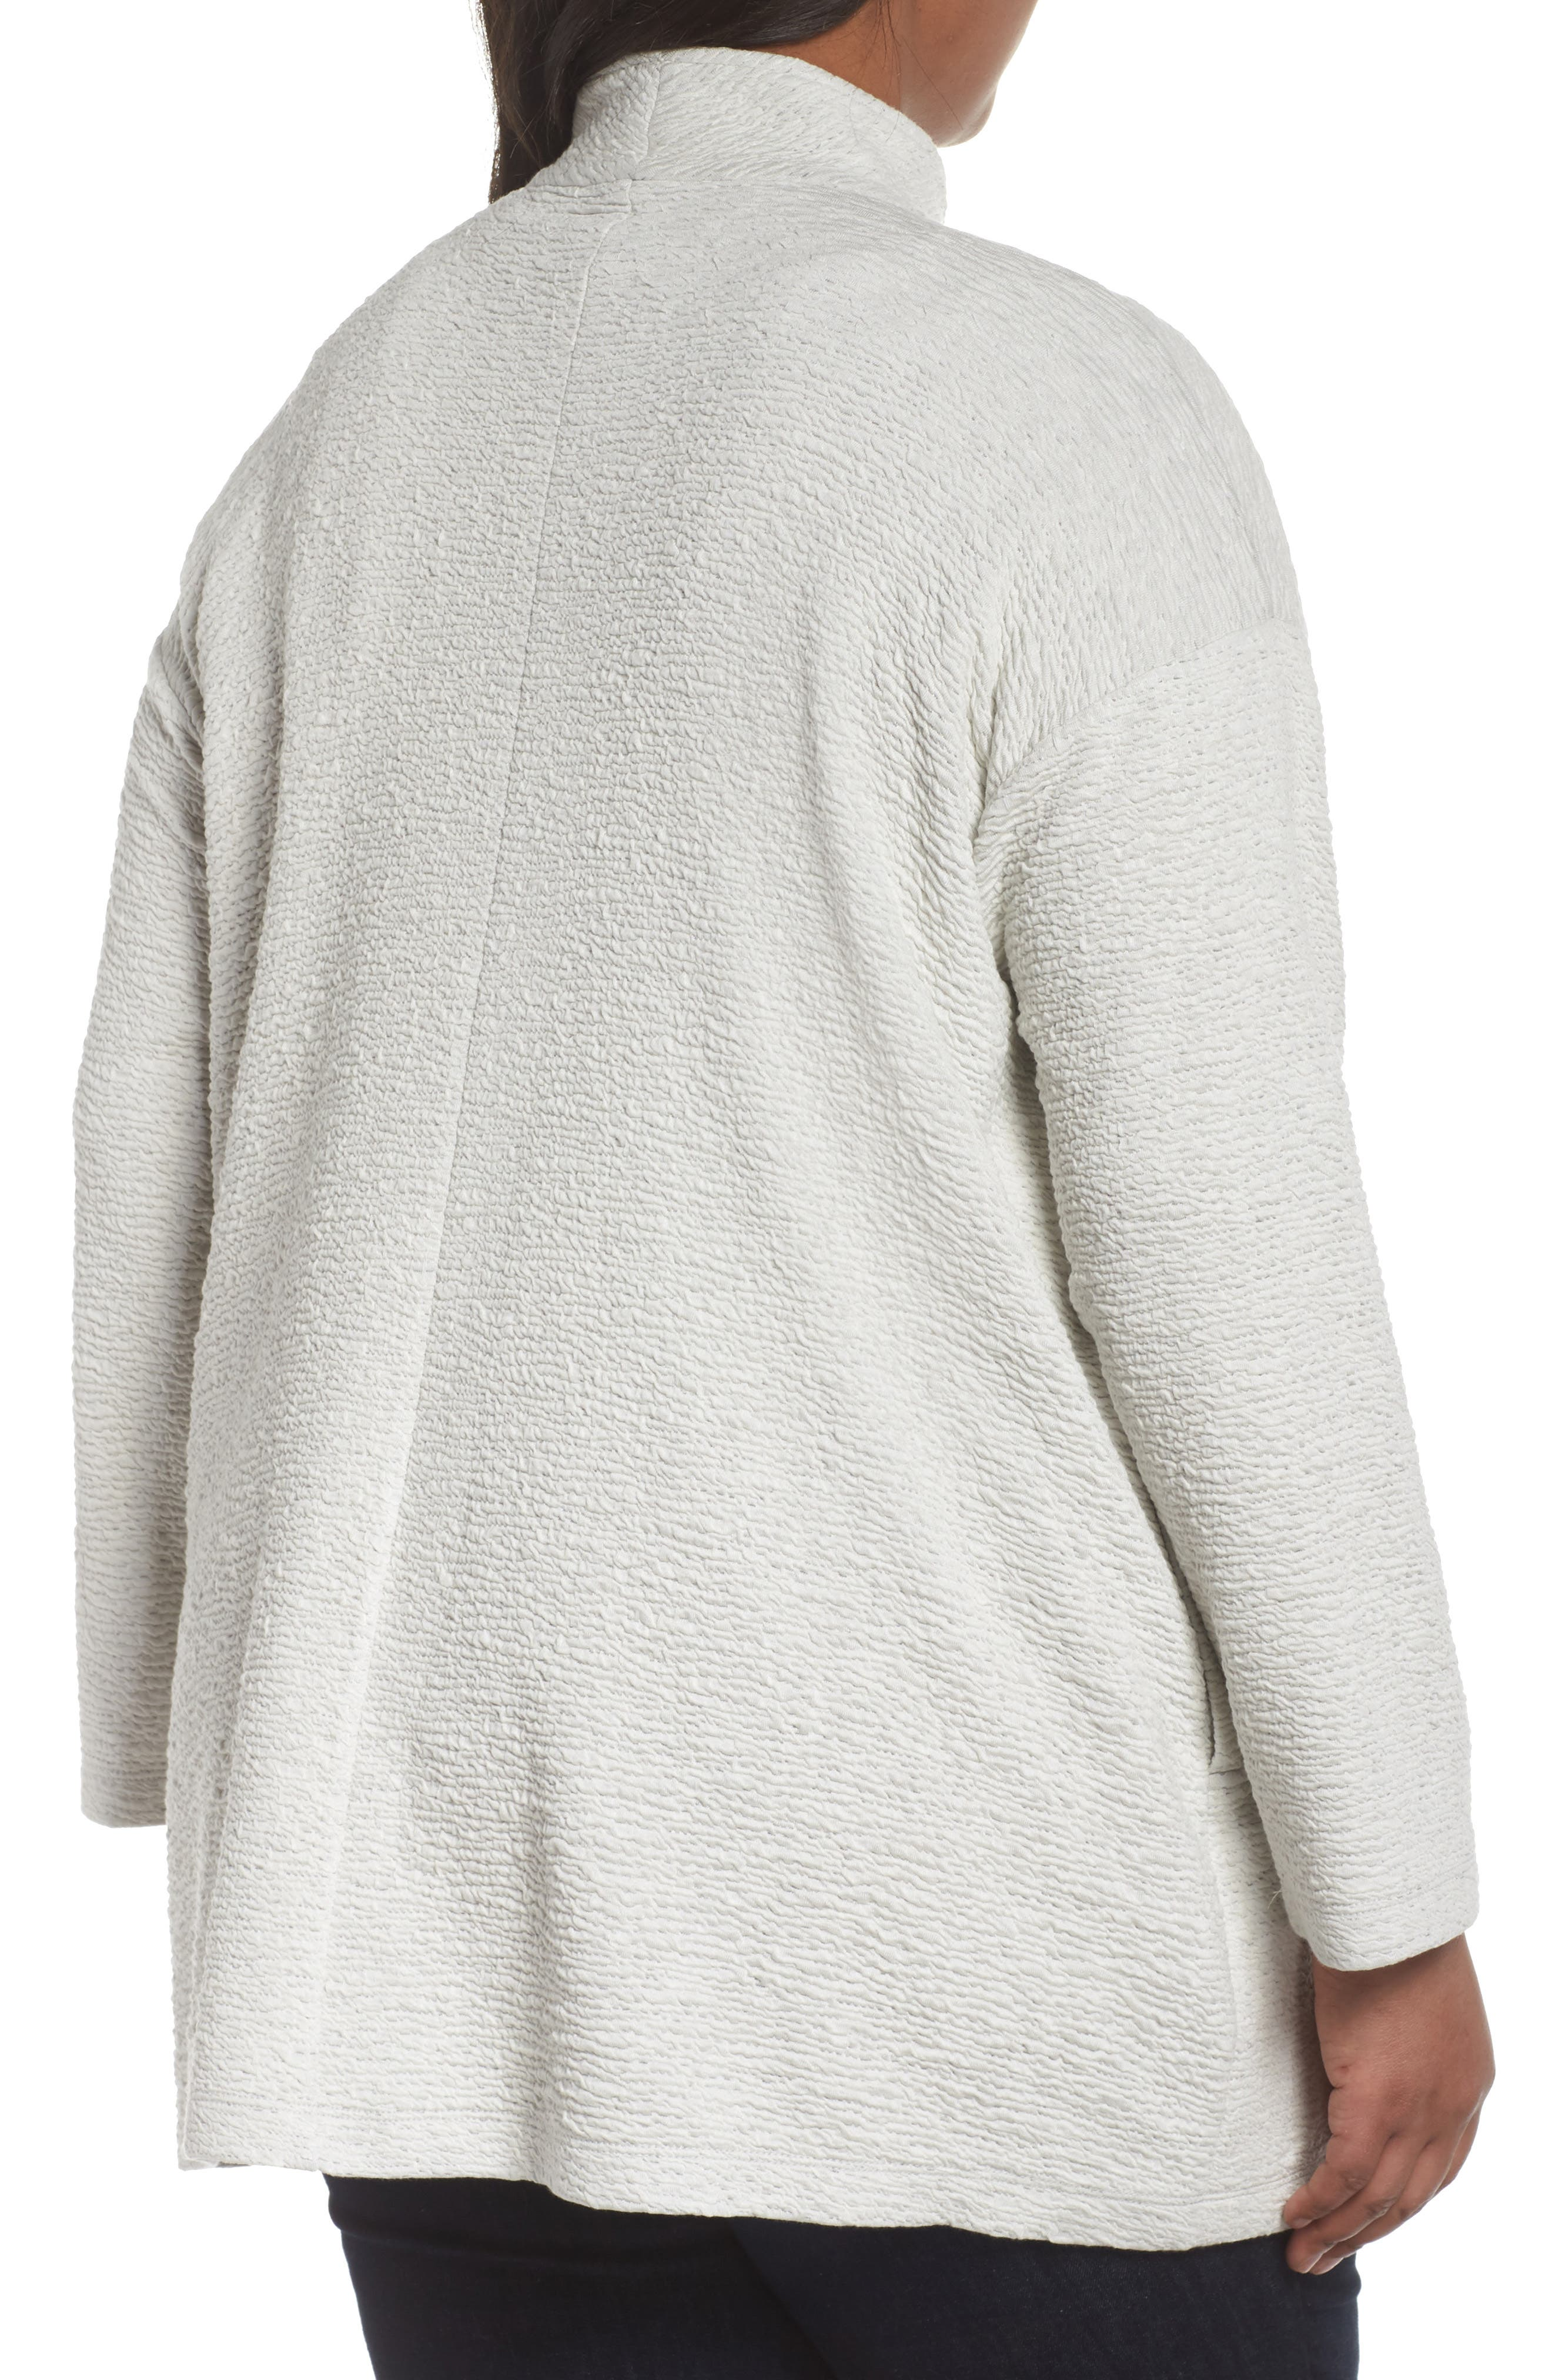 Textured Tencel<sup>®</sup> Lyocell Kimono Jacket,                             Alternate thumbnail 2, color,                             100